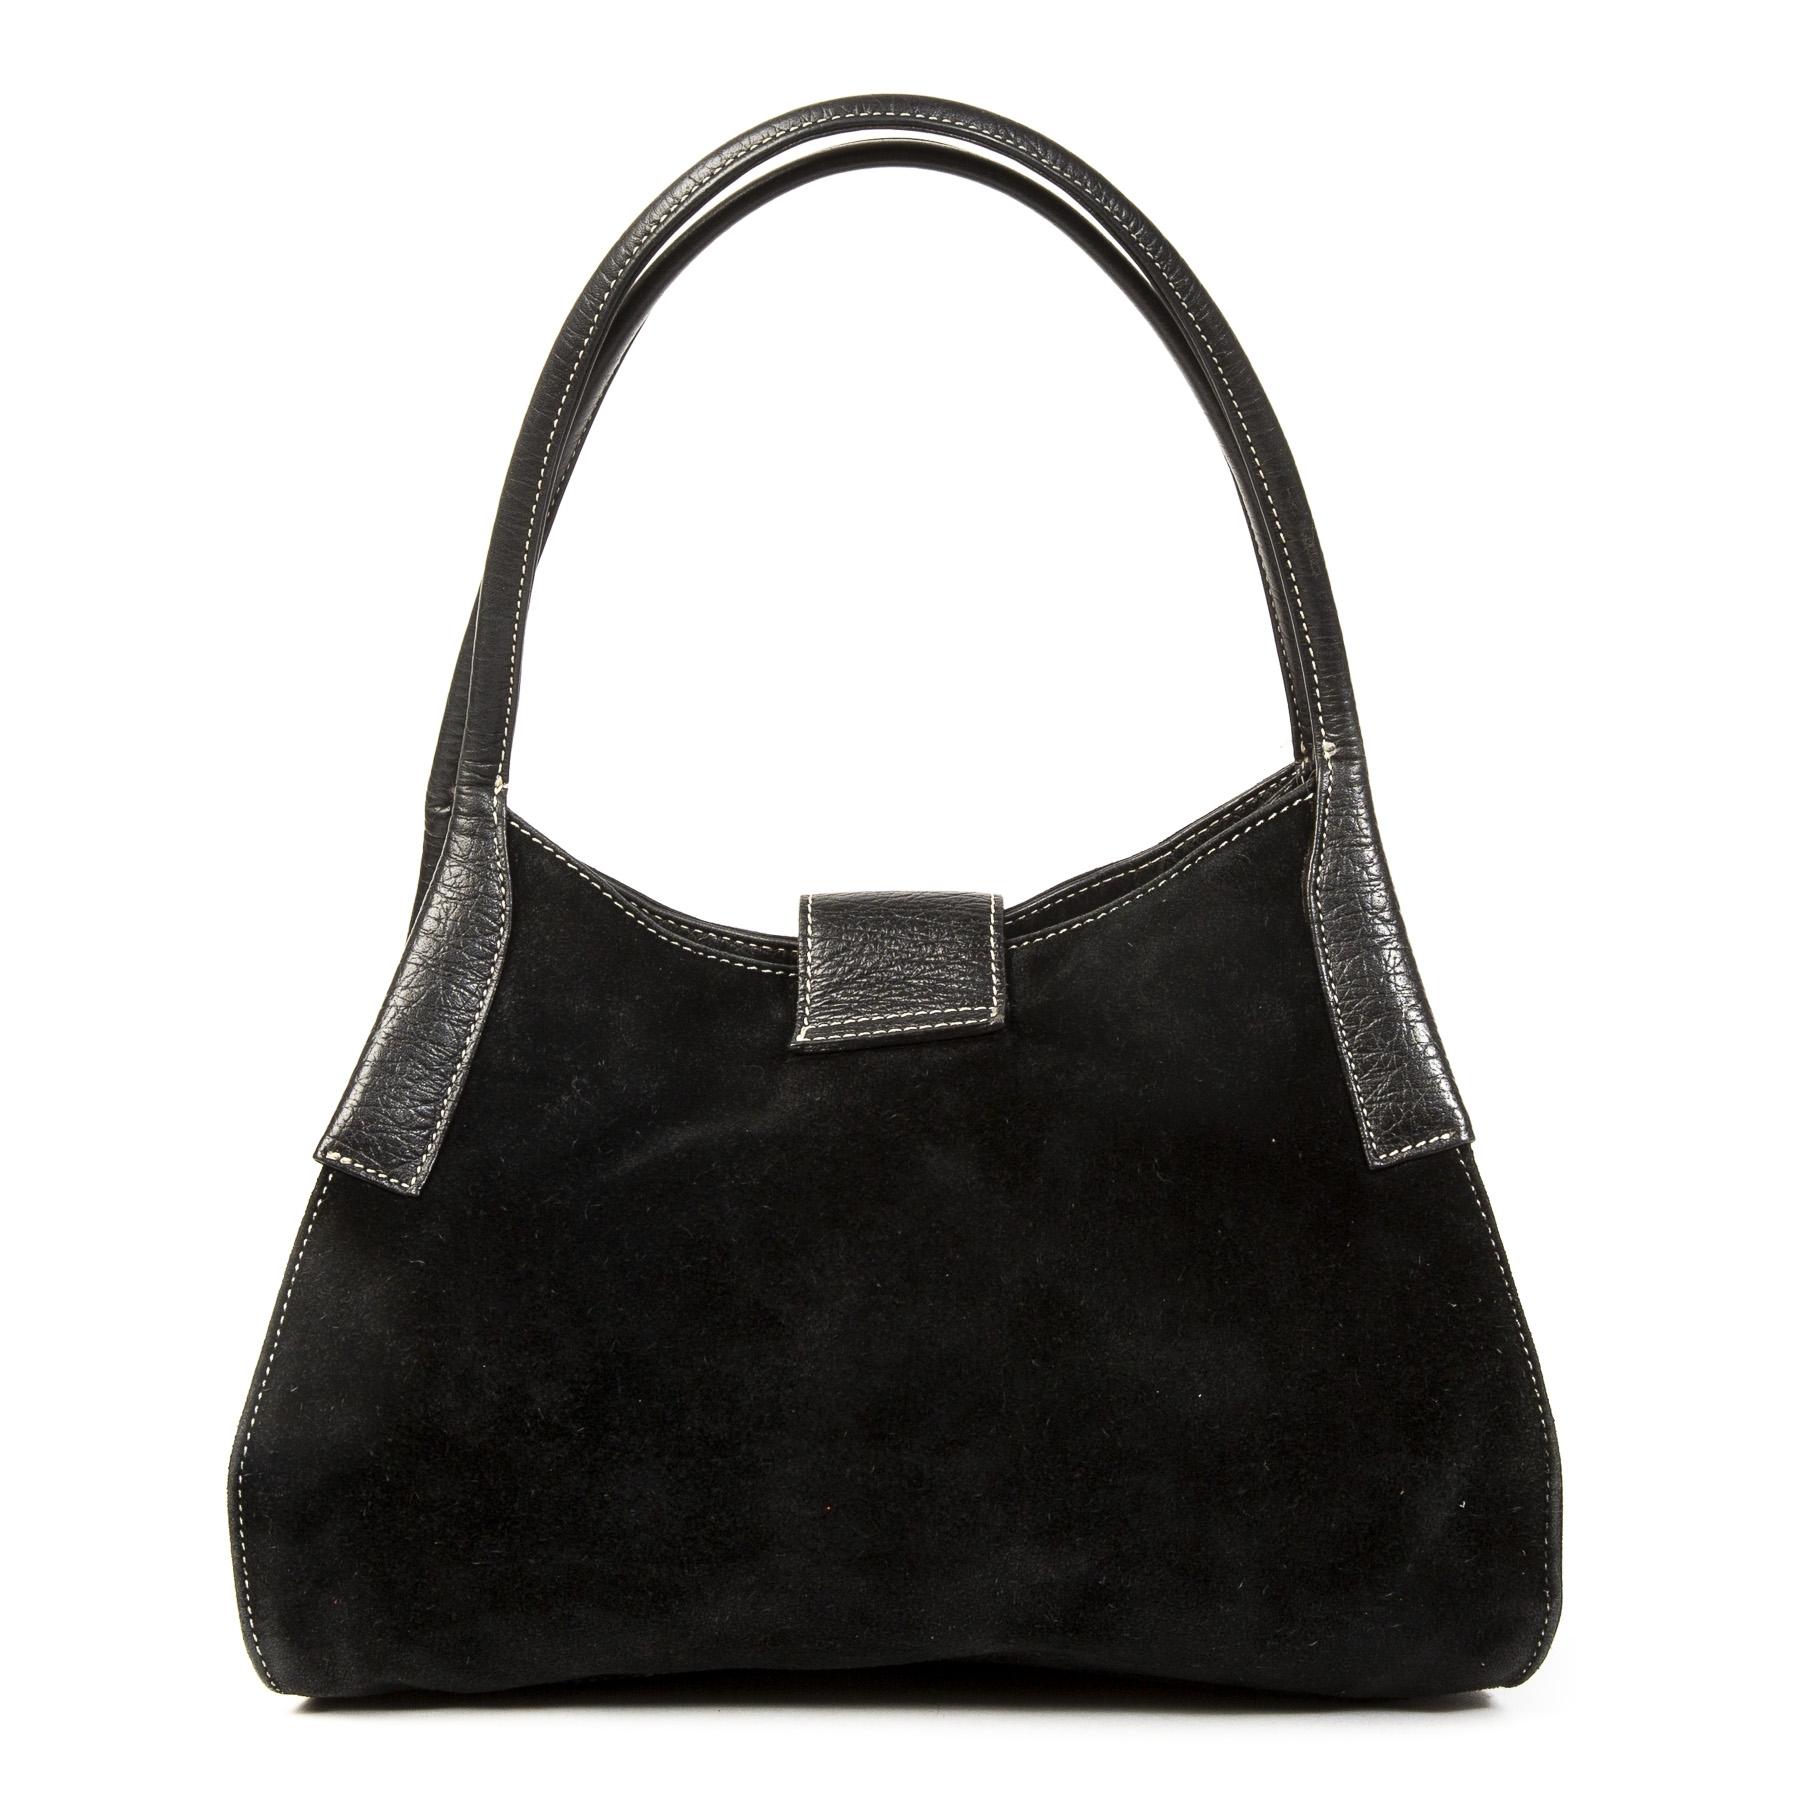 Authentieke tweedehands vintage Tods Black Suede Shoulder Bag koop online webshop LabelLOV